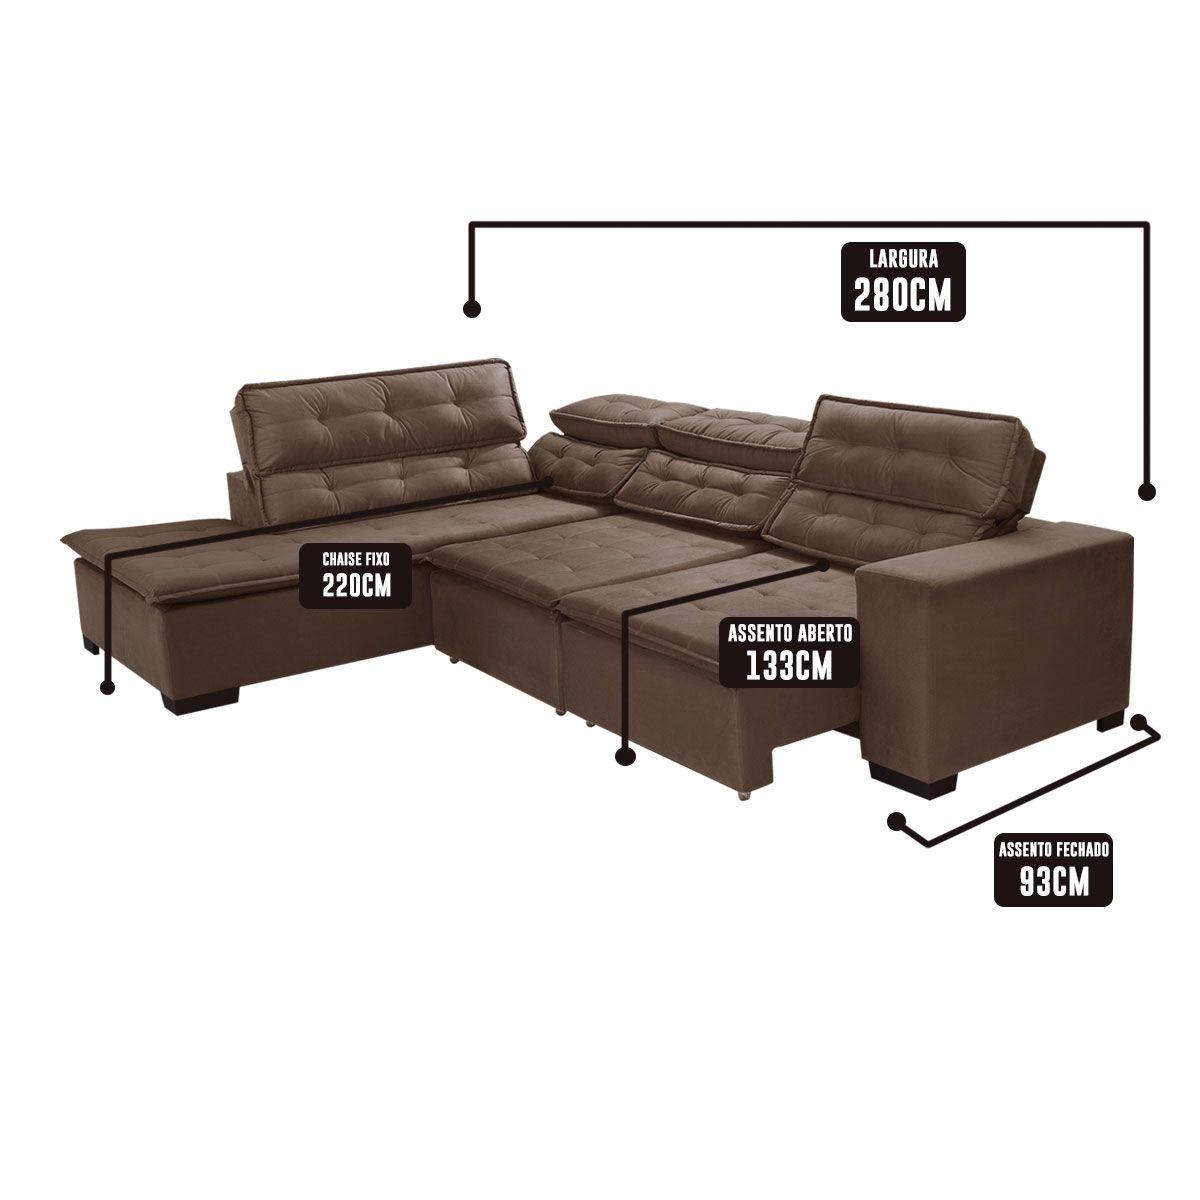 Sofá de Canto Retrátil 5 Lugares Reclinável Chaise 2,80 x 2,20 m Sttilo Marron/Cinza - MegaSul